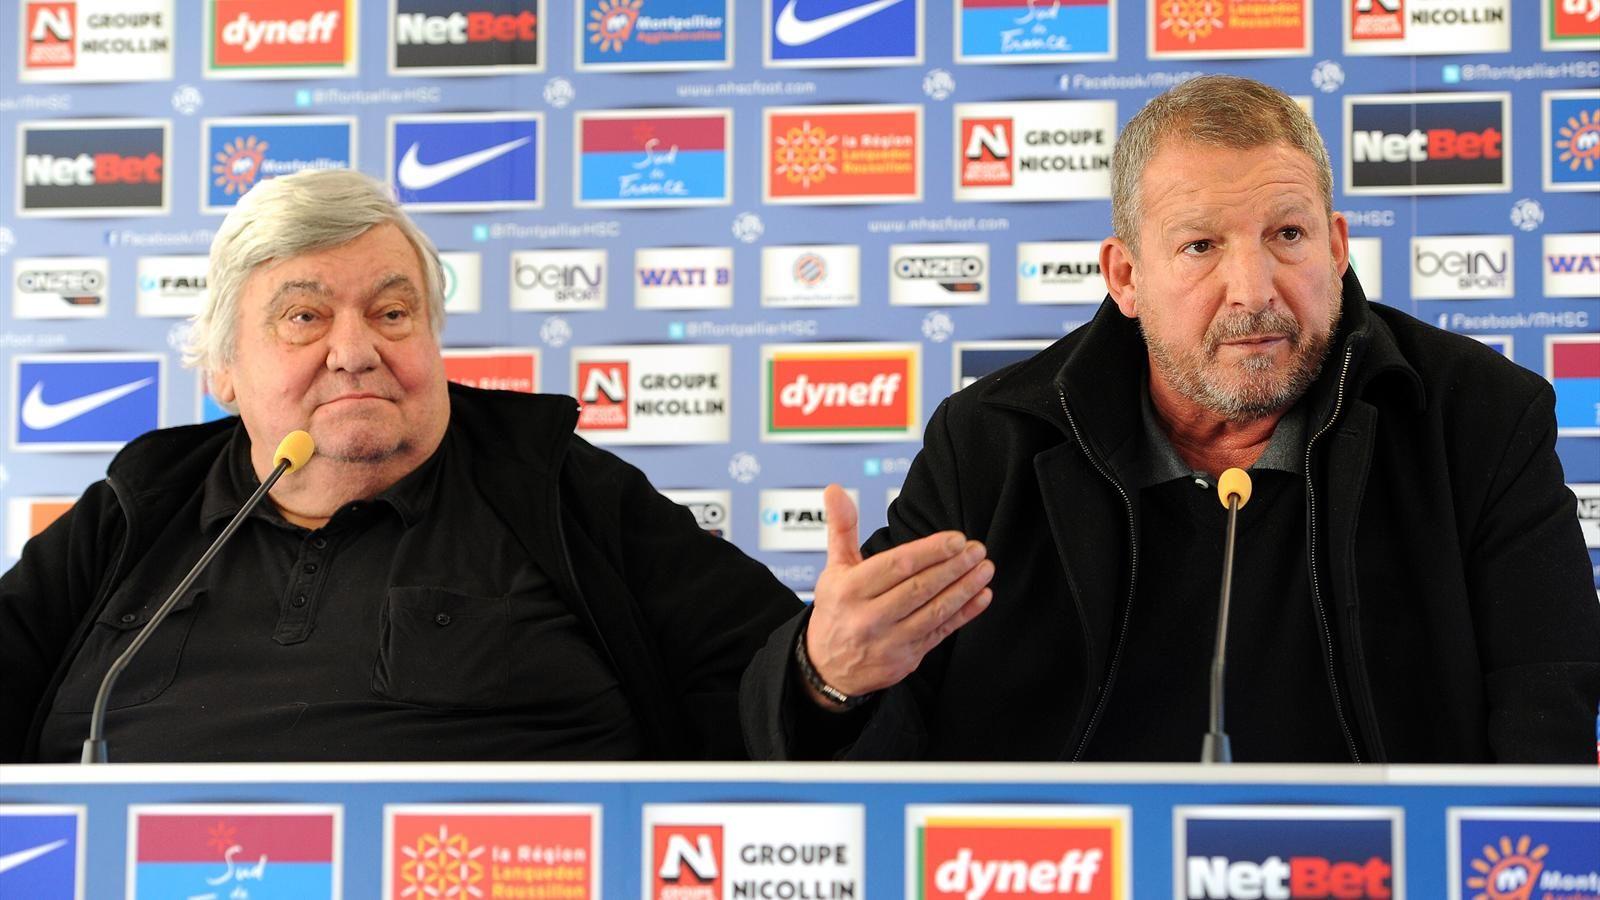 Луи Николлен и Роллан Курбис, Eurosport.fr